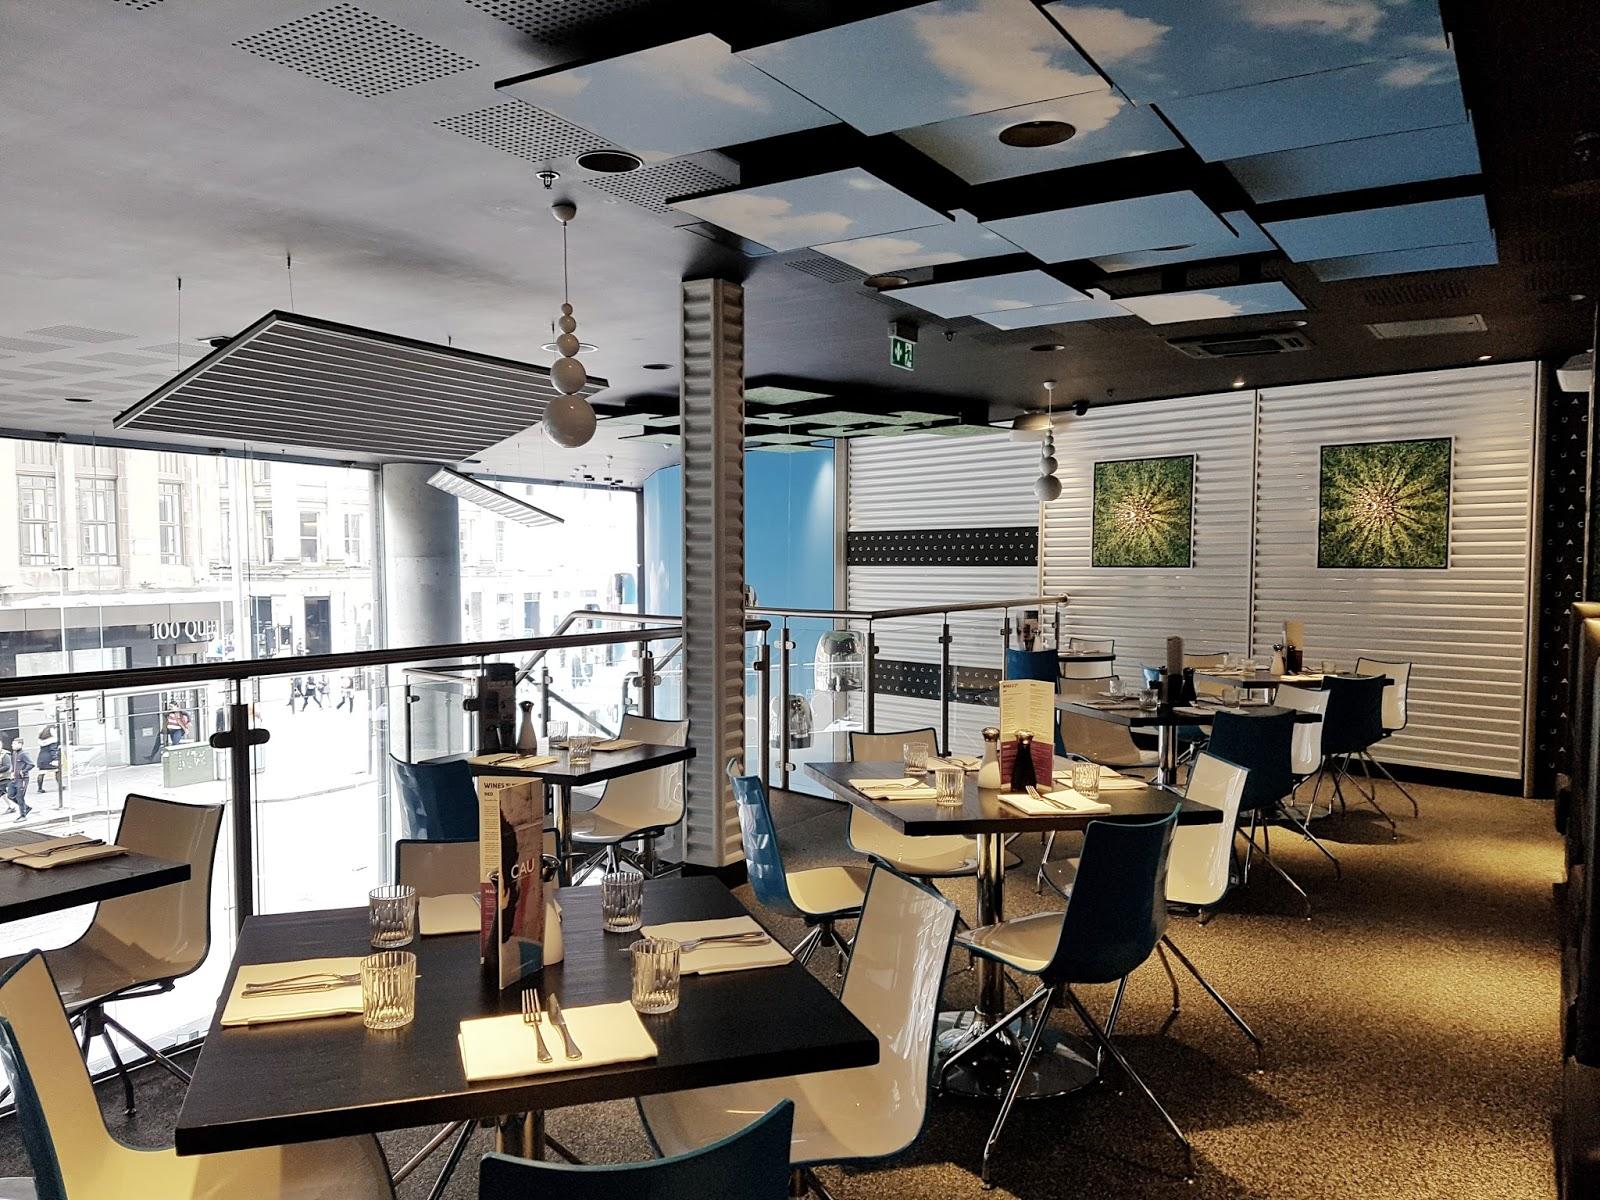 CAU restaurant in glasgow